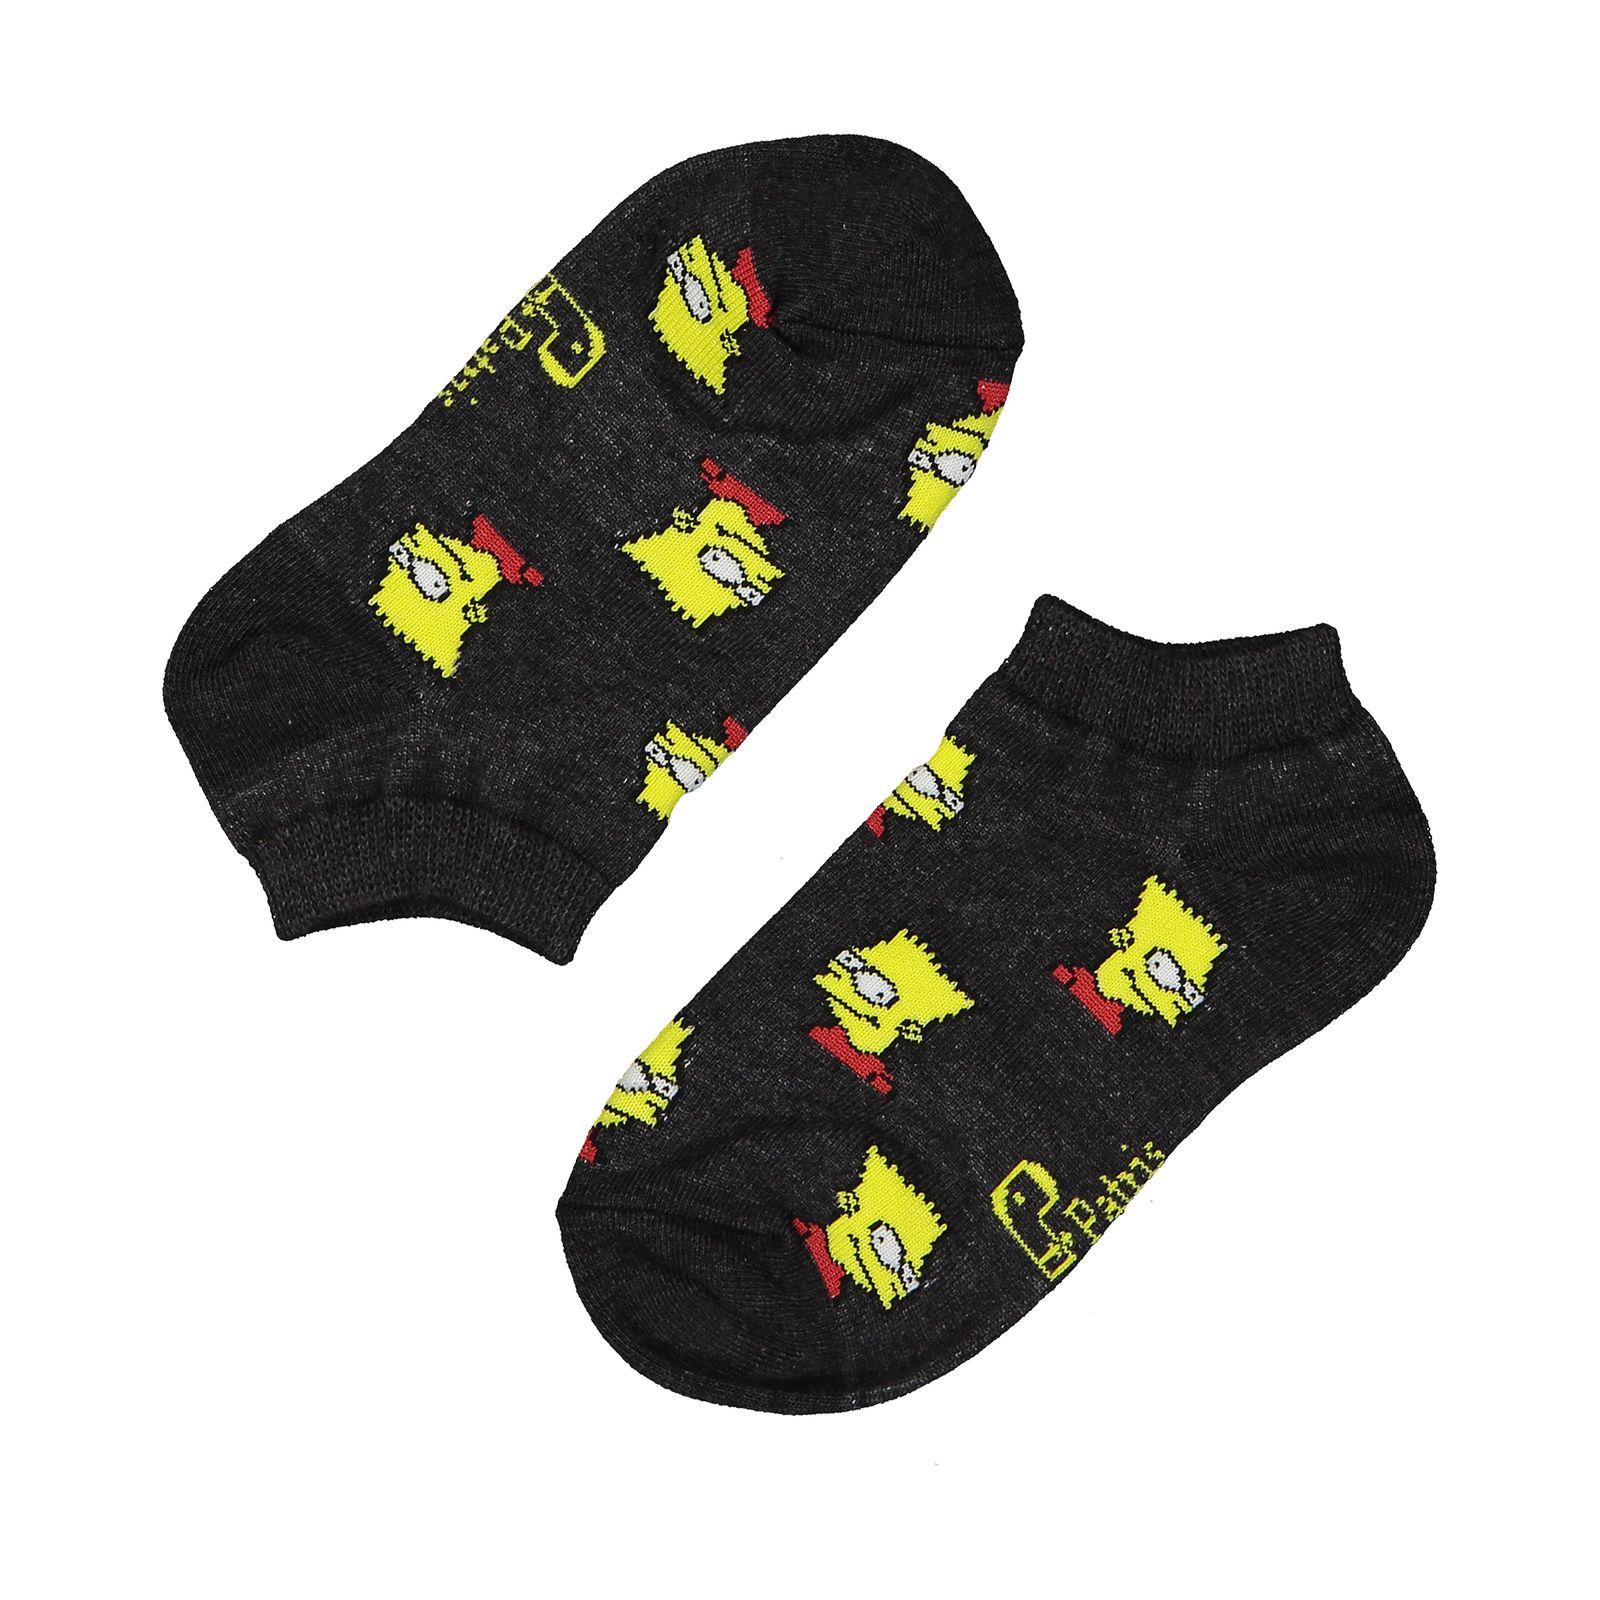 جوراب بچگانه پاتریس طرح سیمپسون مدل 2271192-94 -  - 2